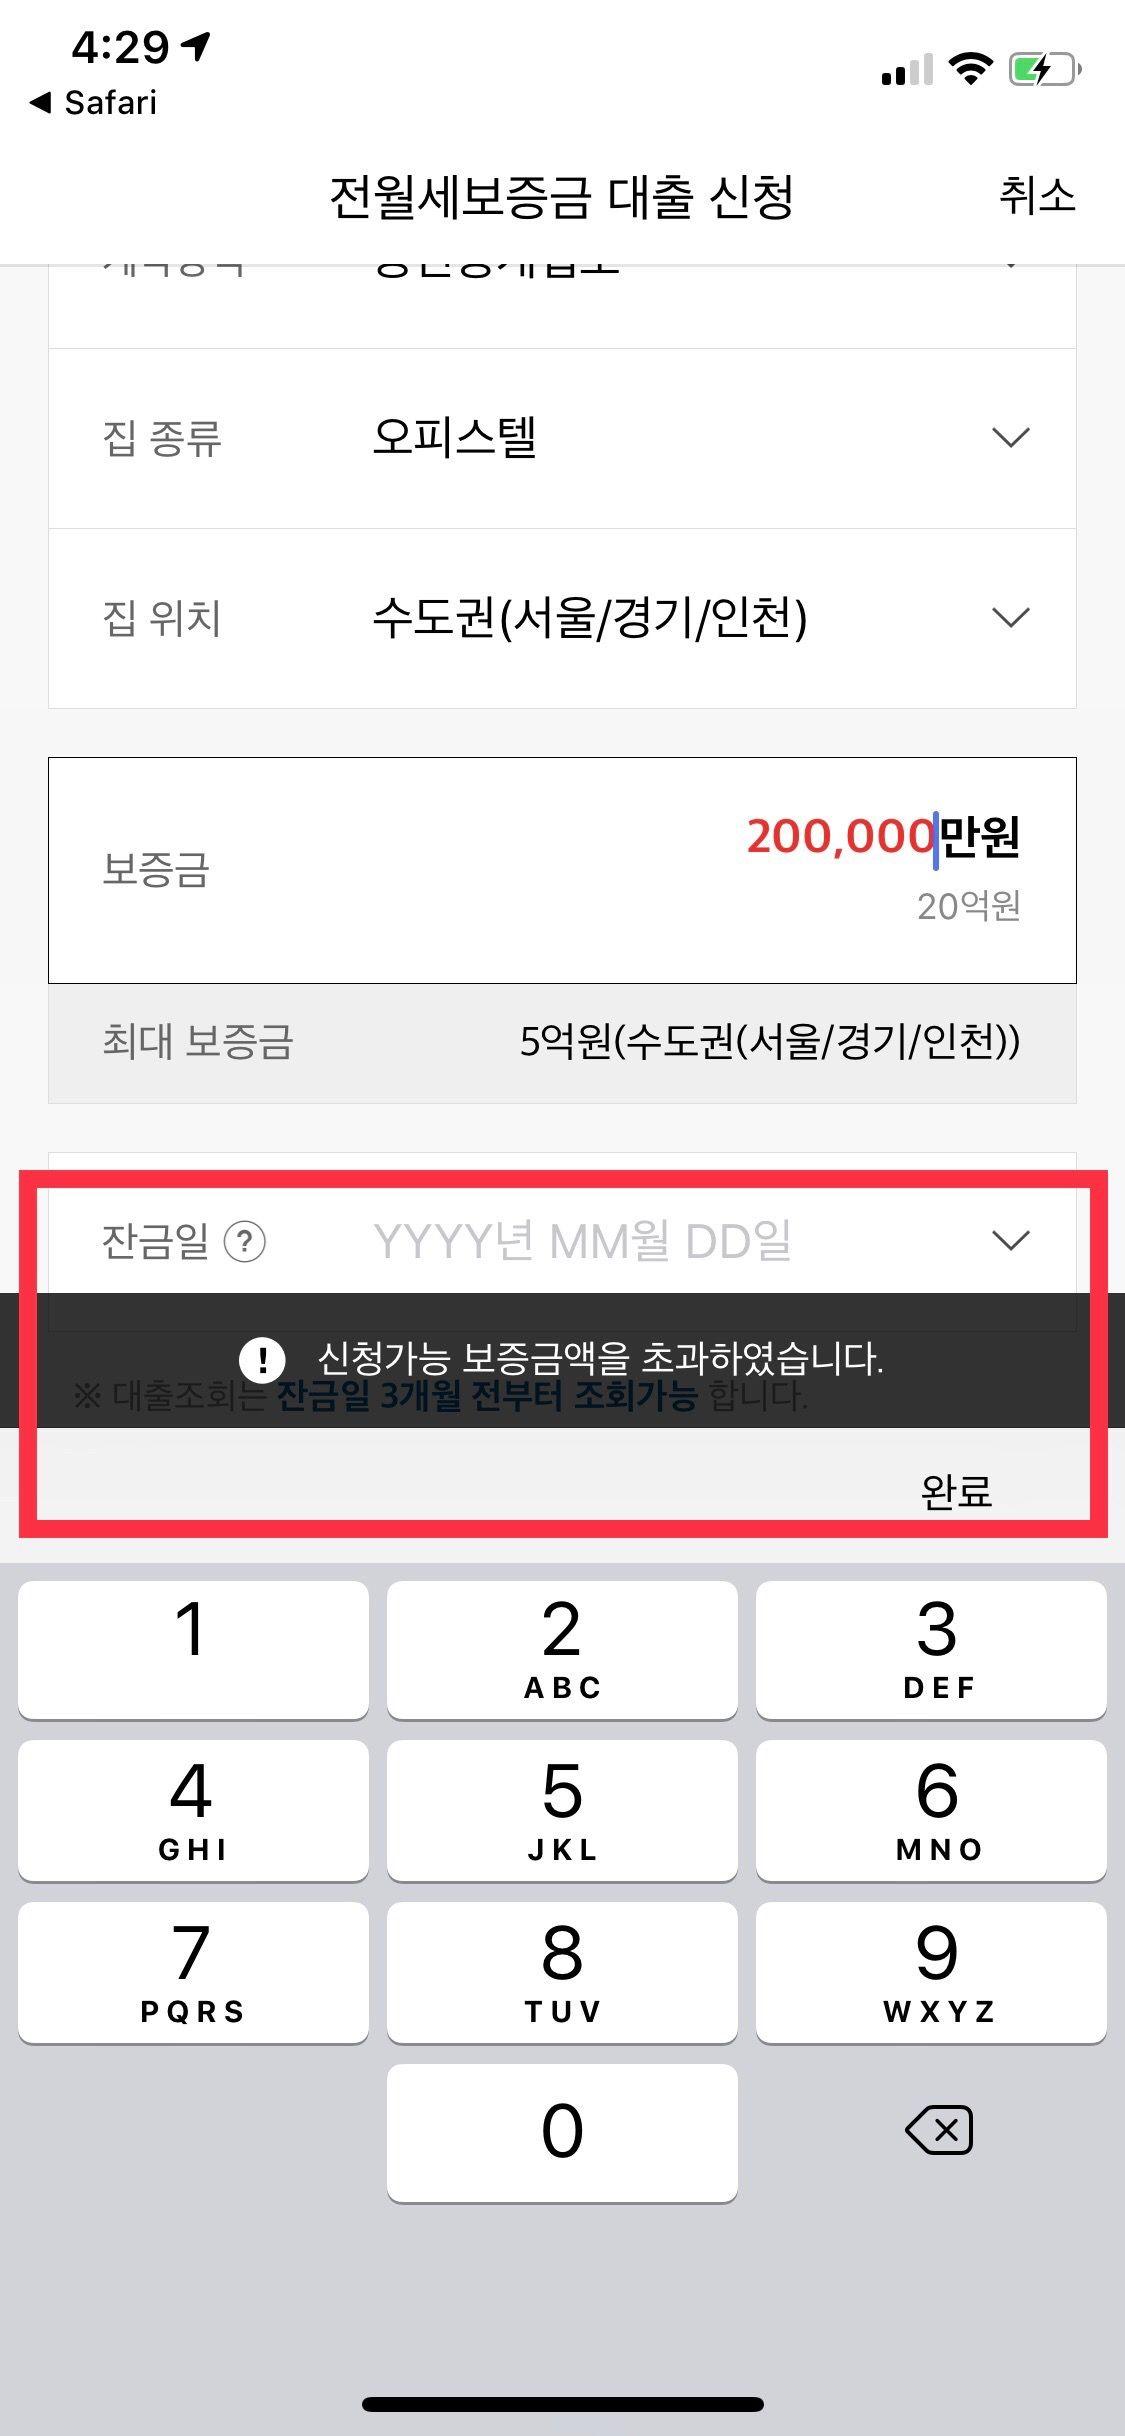 Ui_mobile에 있뚔 핀